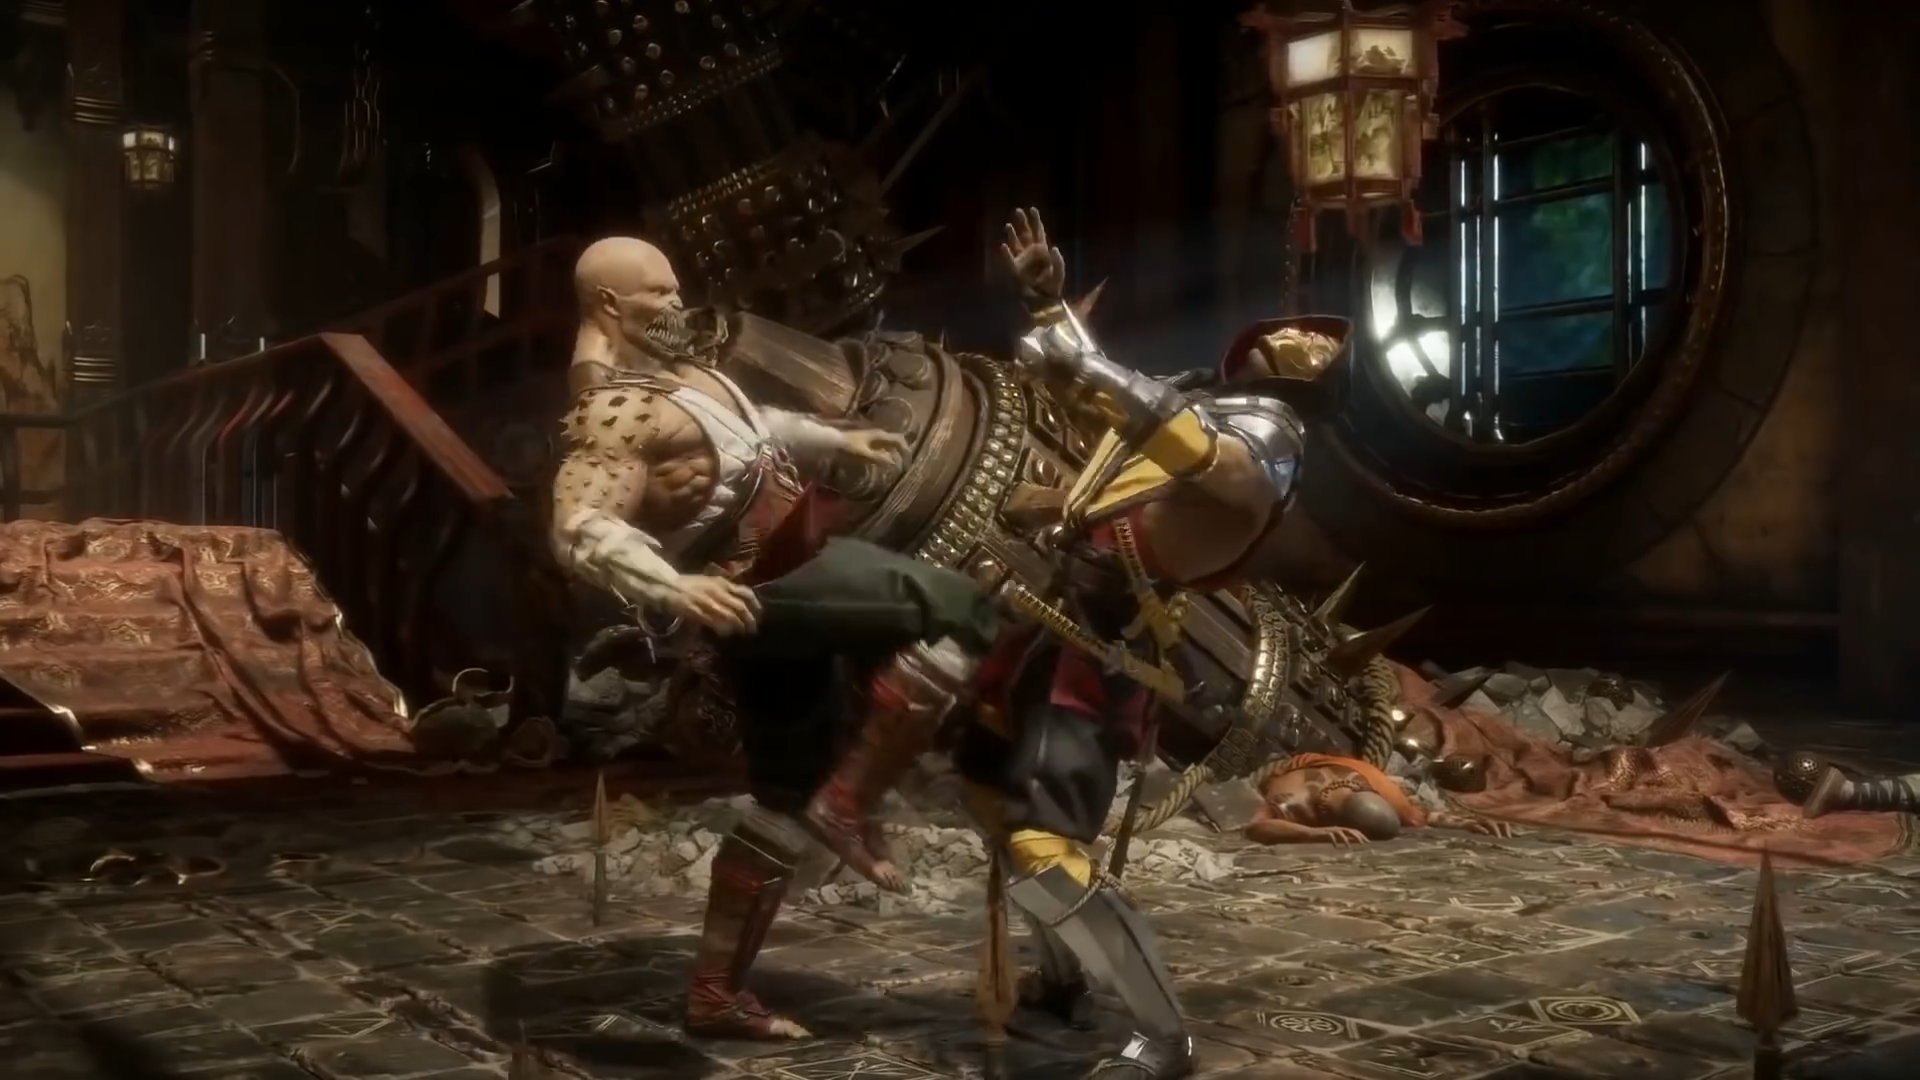 IMG_20190121_193215.088.jpg - Mortal Kombat 11